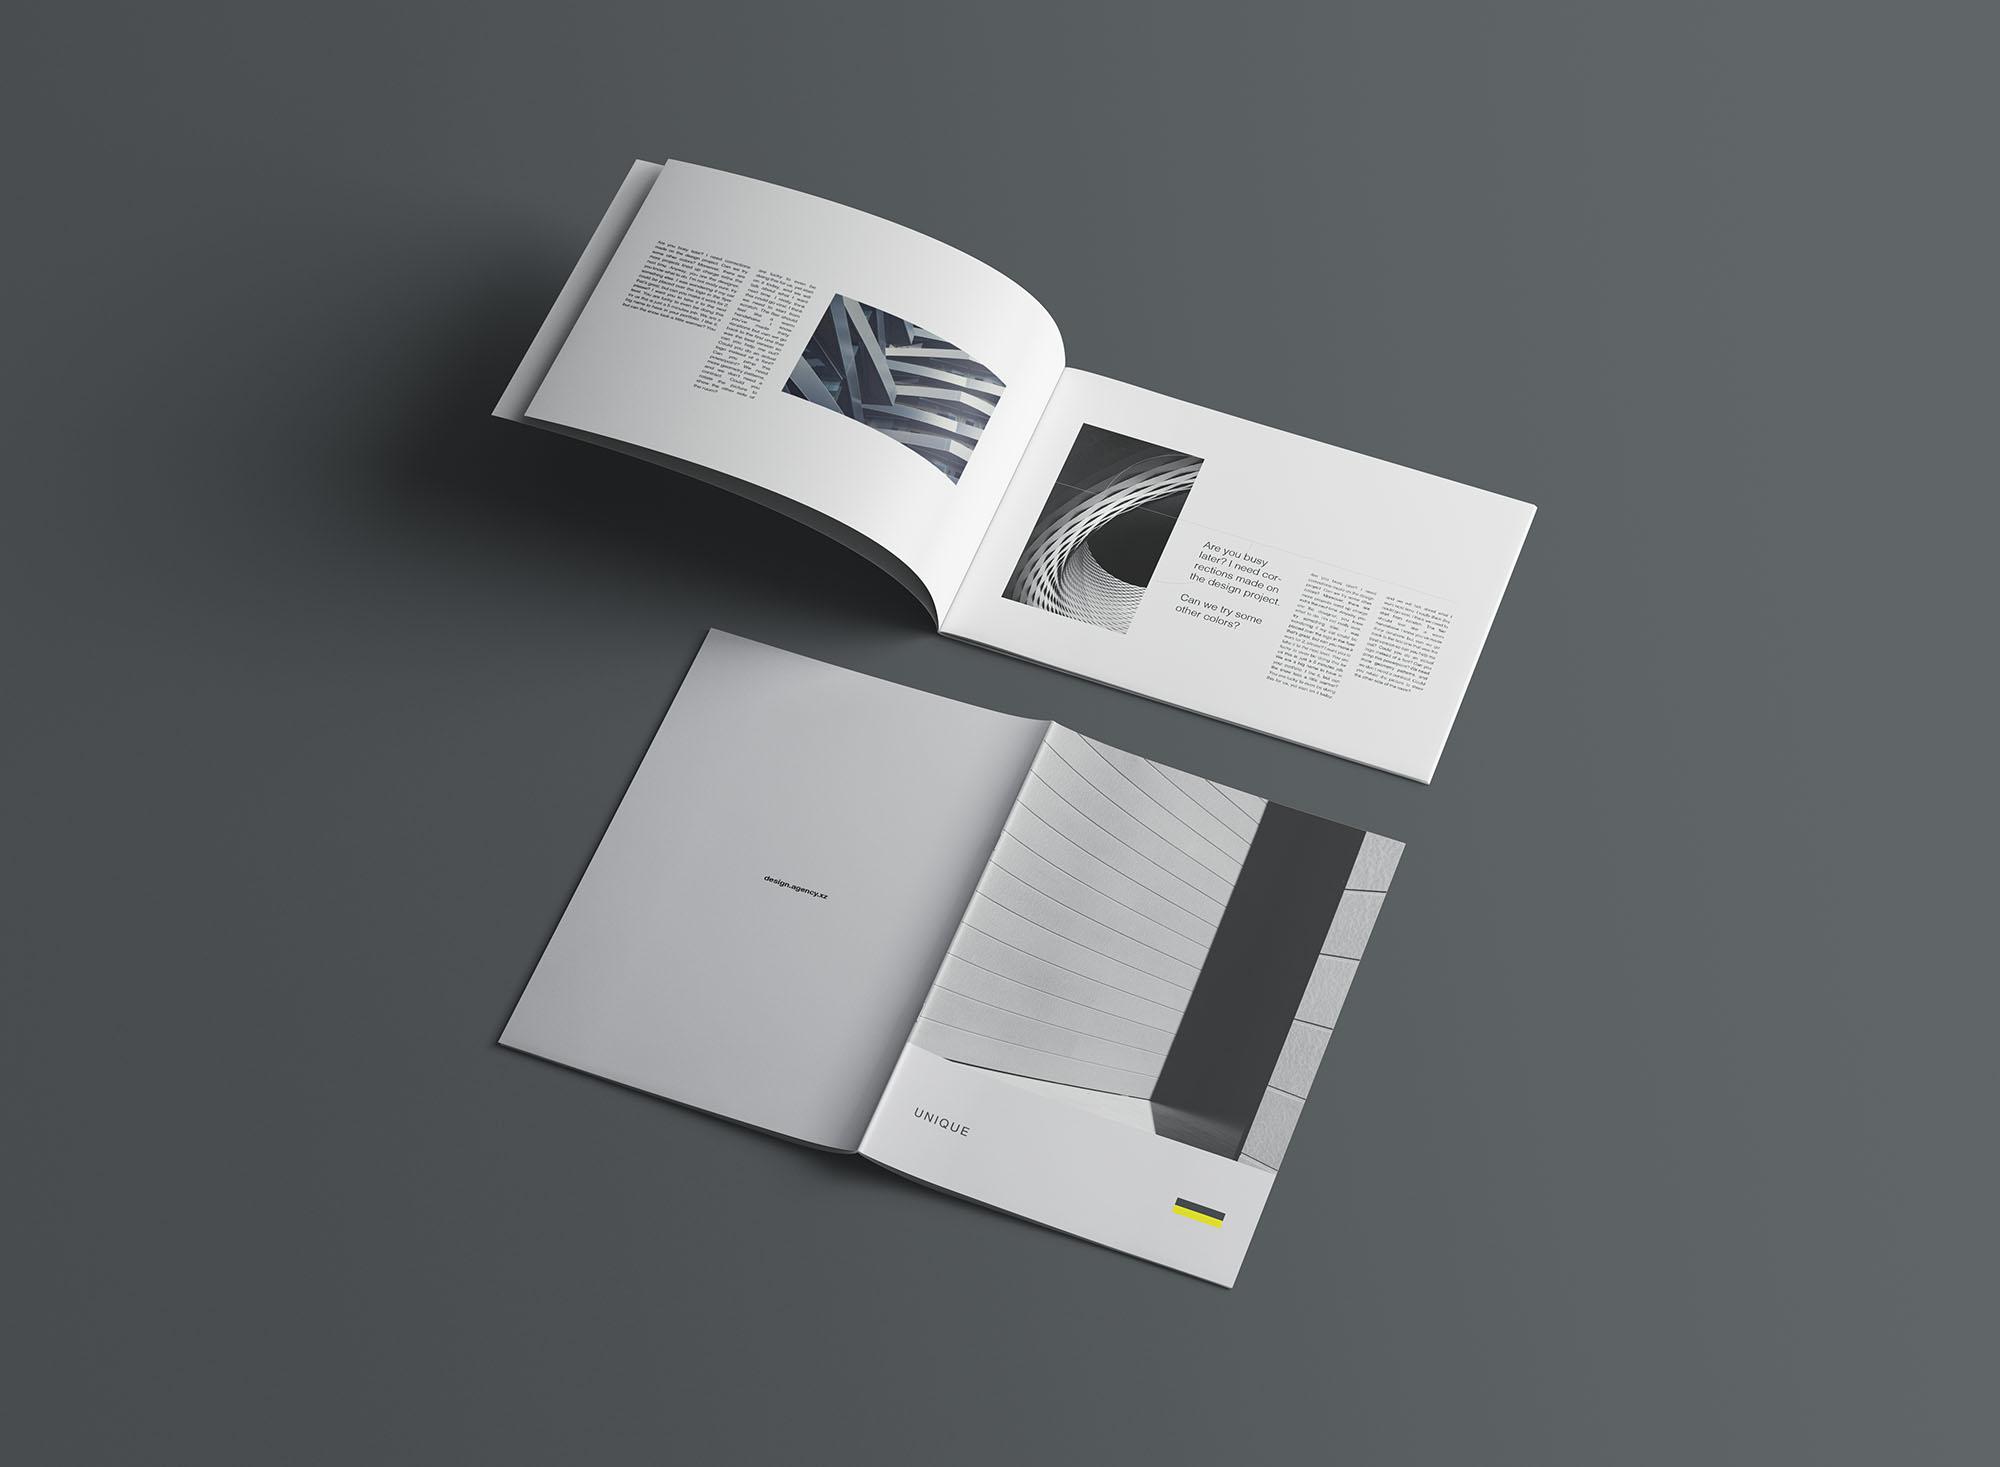 A4 Portrait & Landscape Brochure Mockup 5